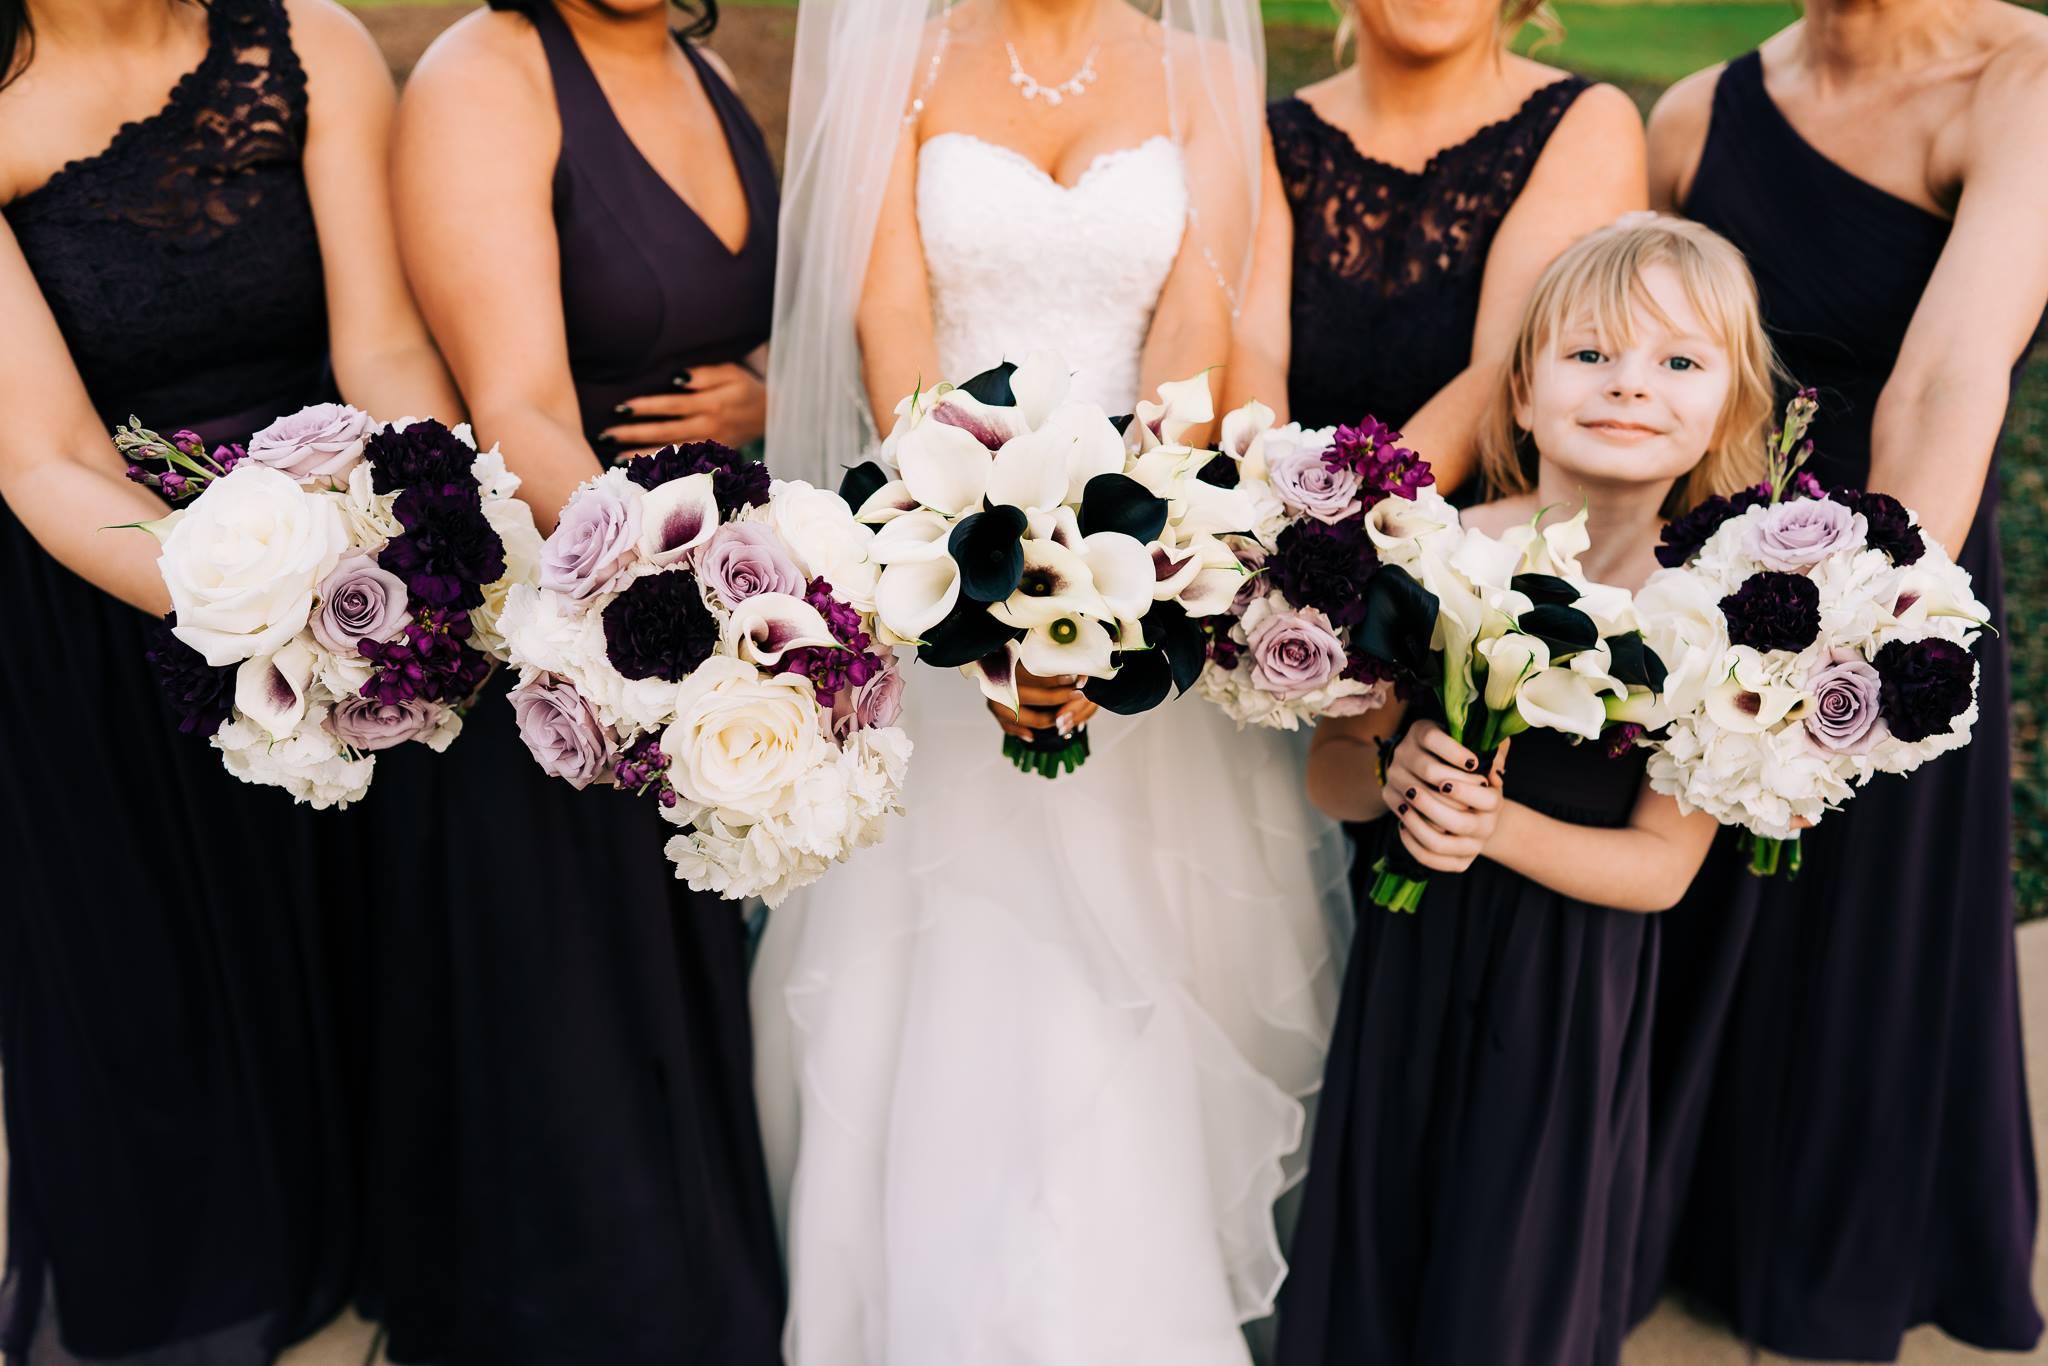 Aubrey-Texas-Harmony-Chapel-Wedding-Florist-David-Co.-11.jpg